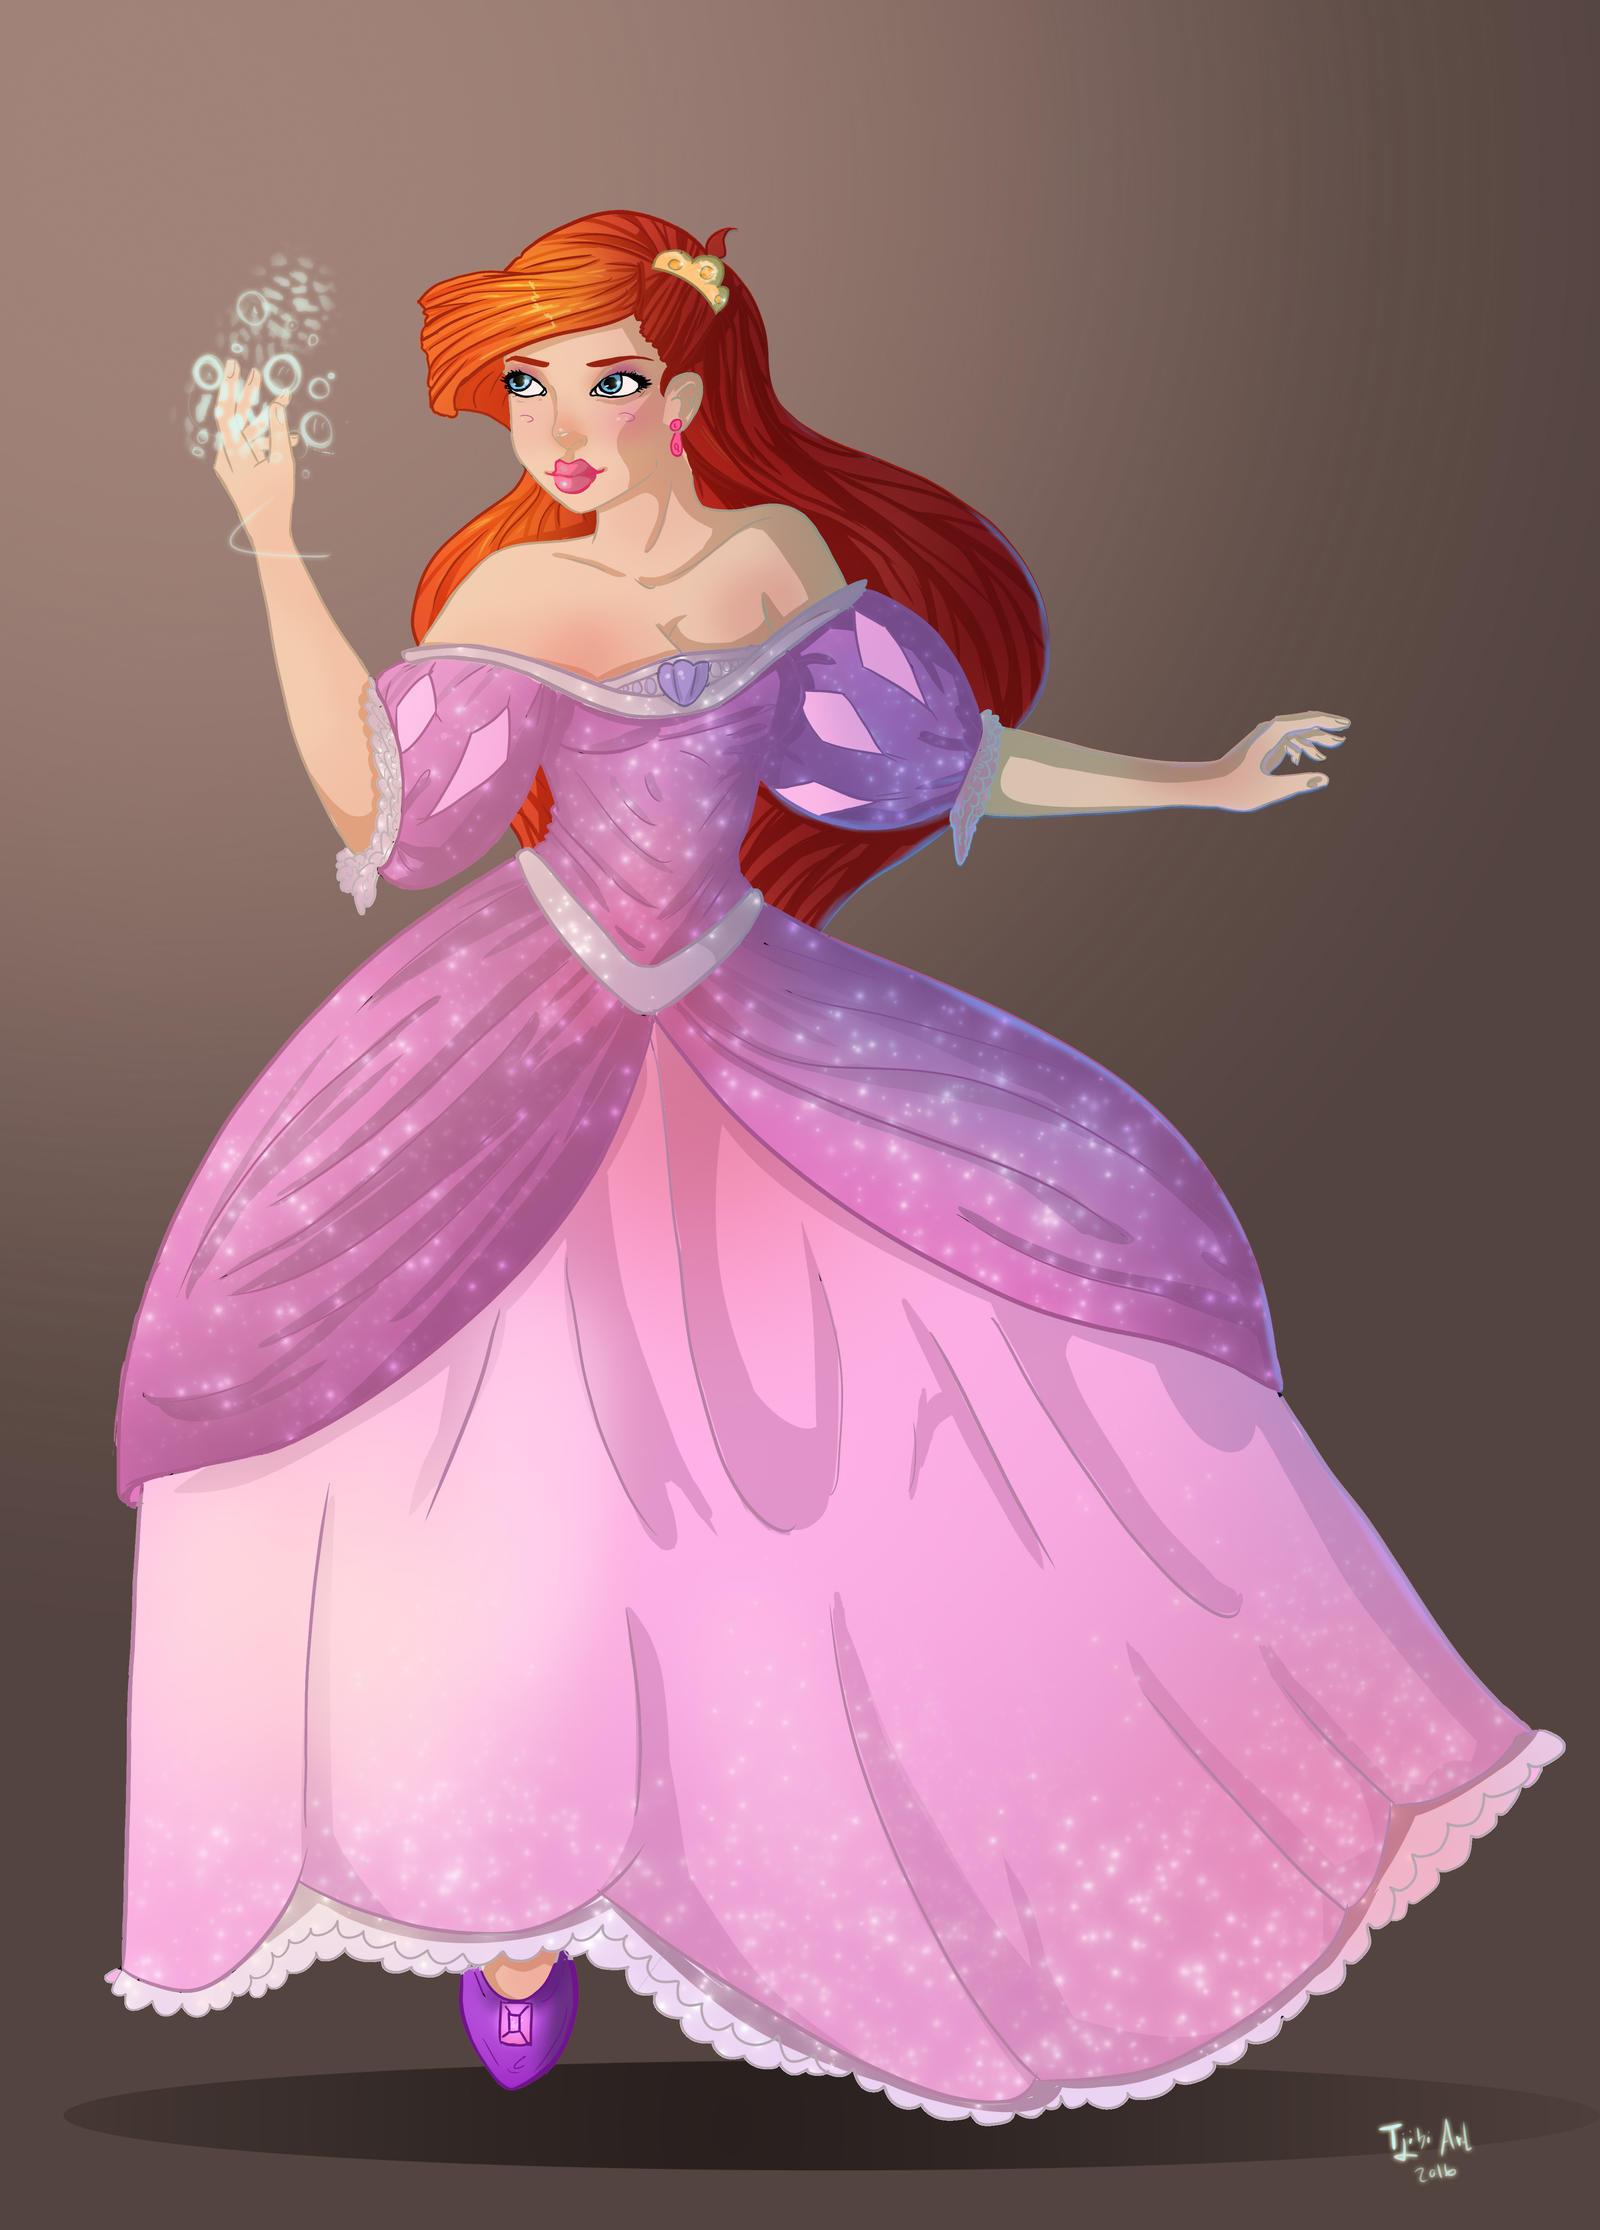 Ariel - Pink dress by Tjibi on DeviantArt